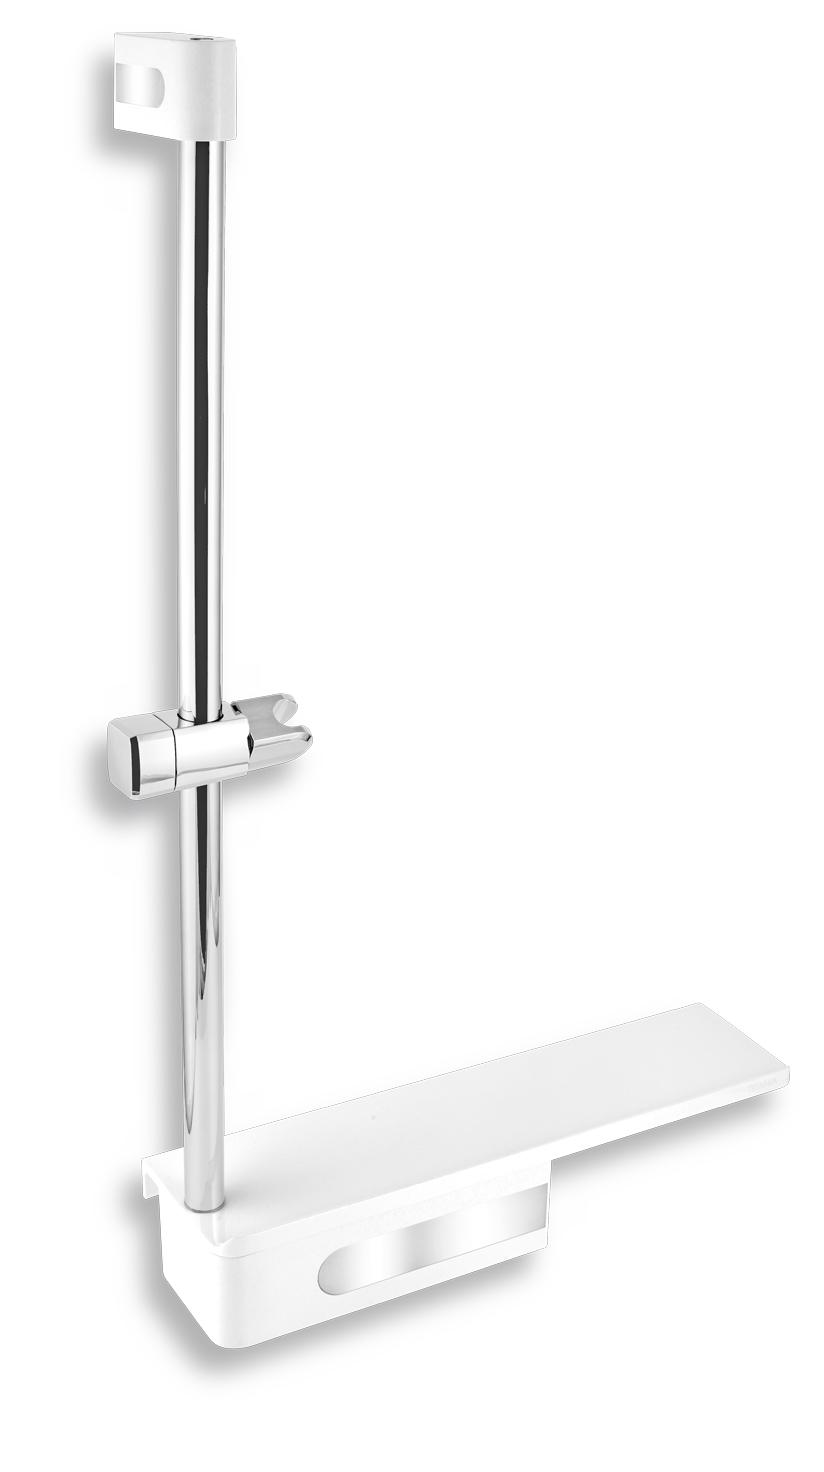 NOVASERVIS - Posuvný držák sprchy s poličkou (65586,4)